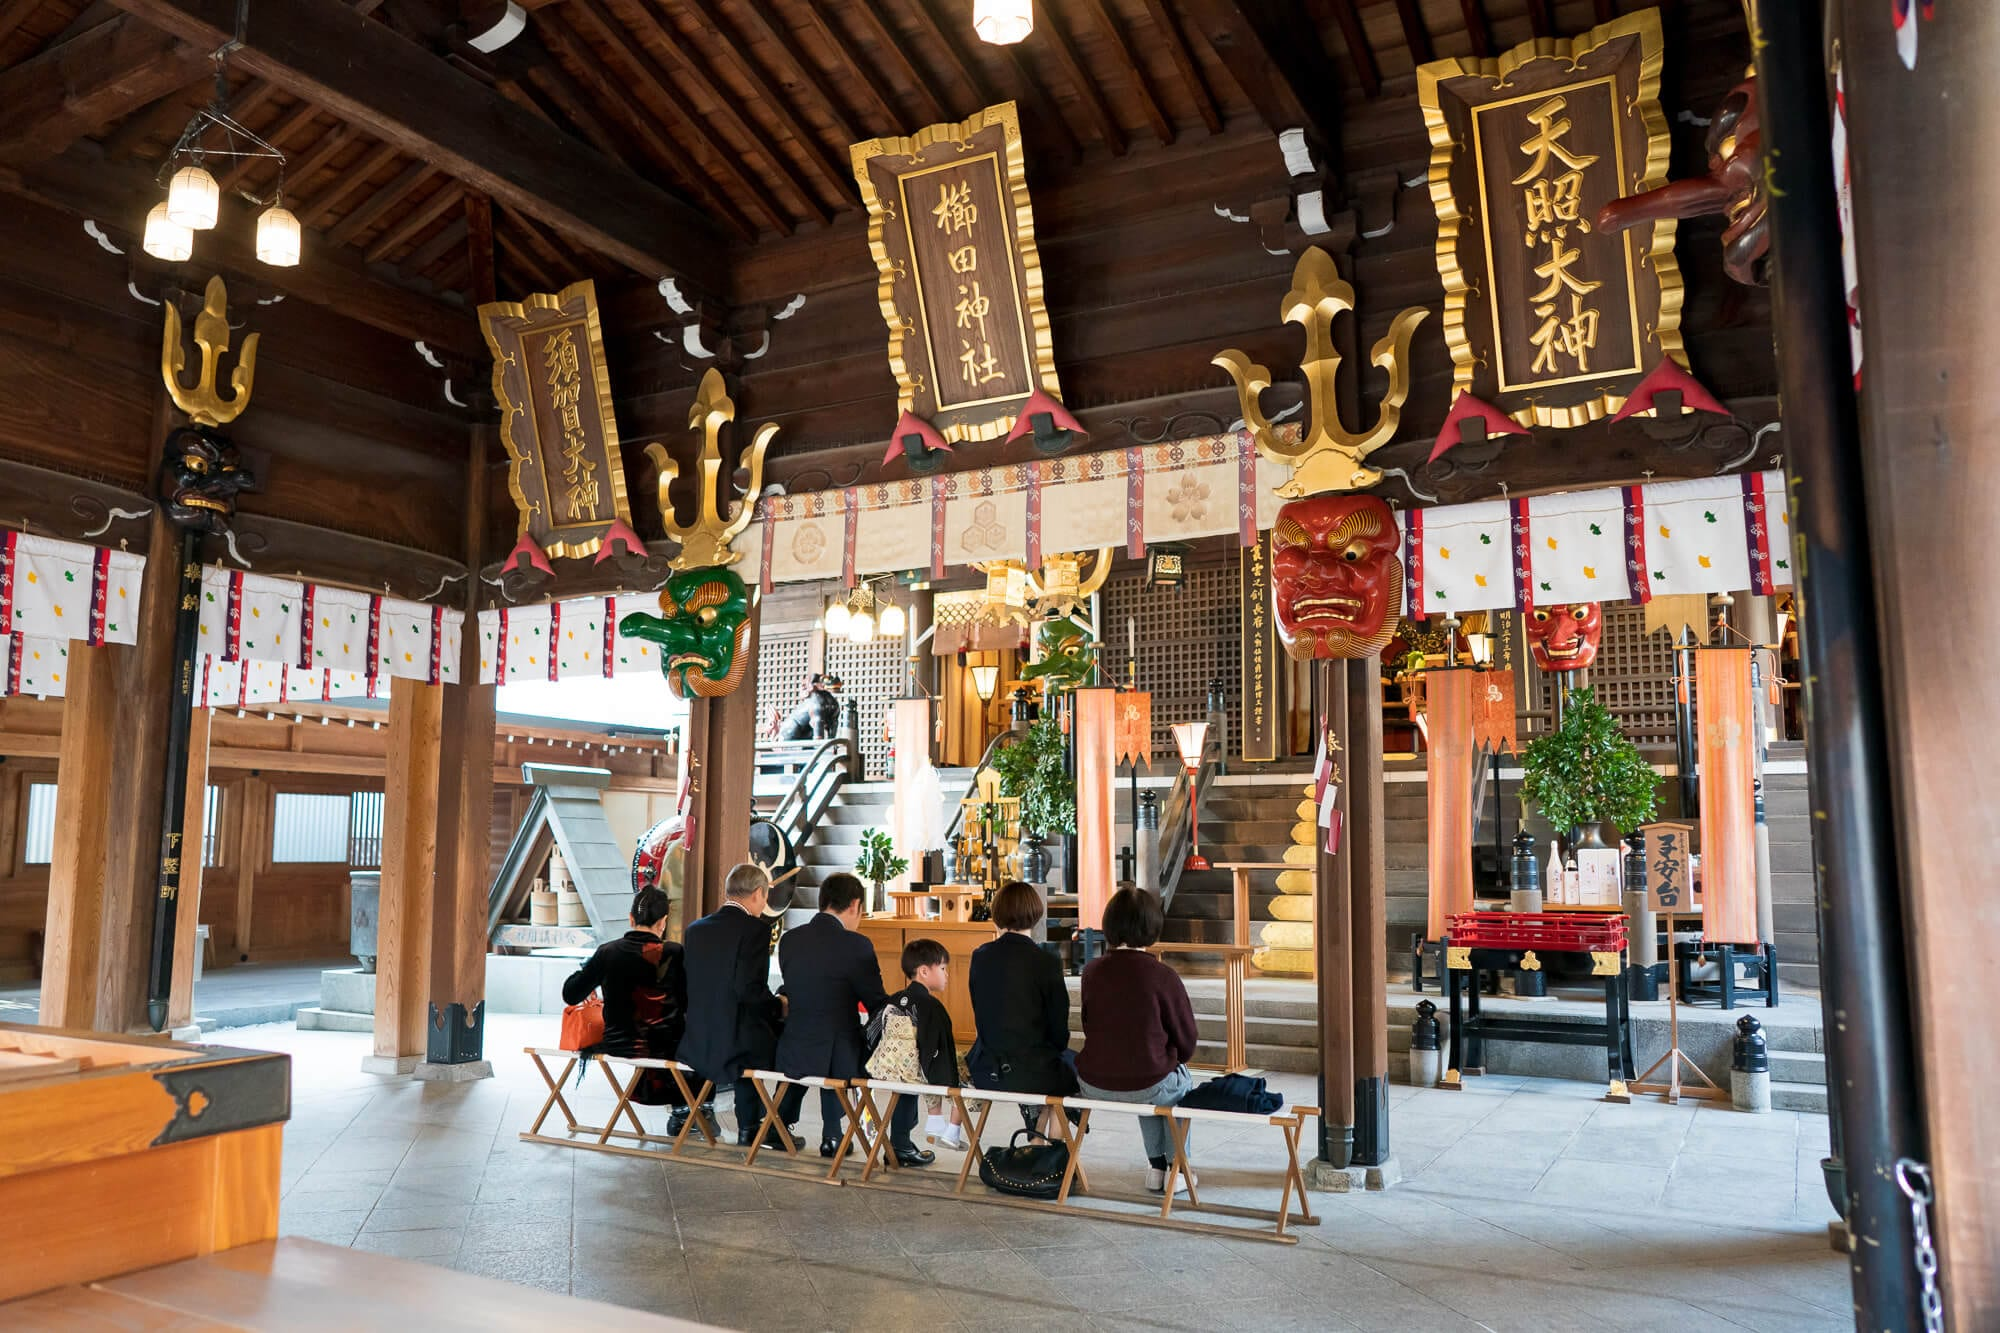 豪華絢爛な櫛田神社の御神殿